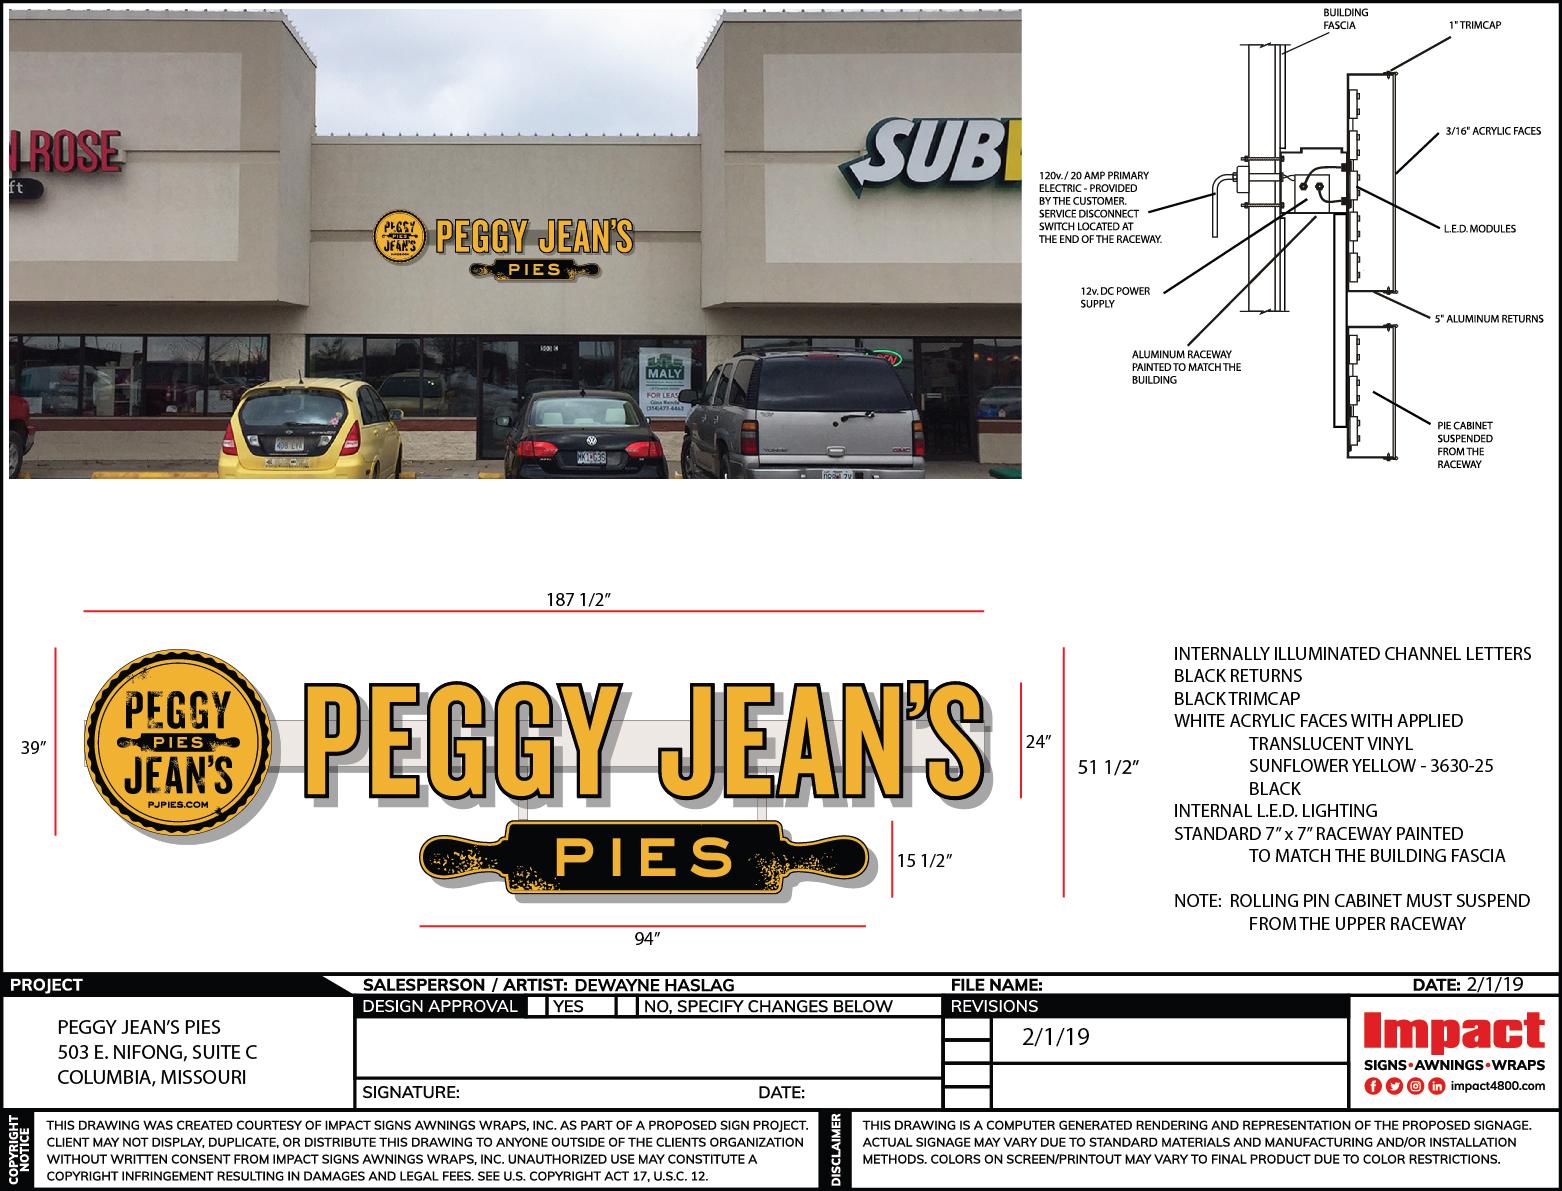 peggy jeans pies rockbridge location rev.jpg